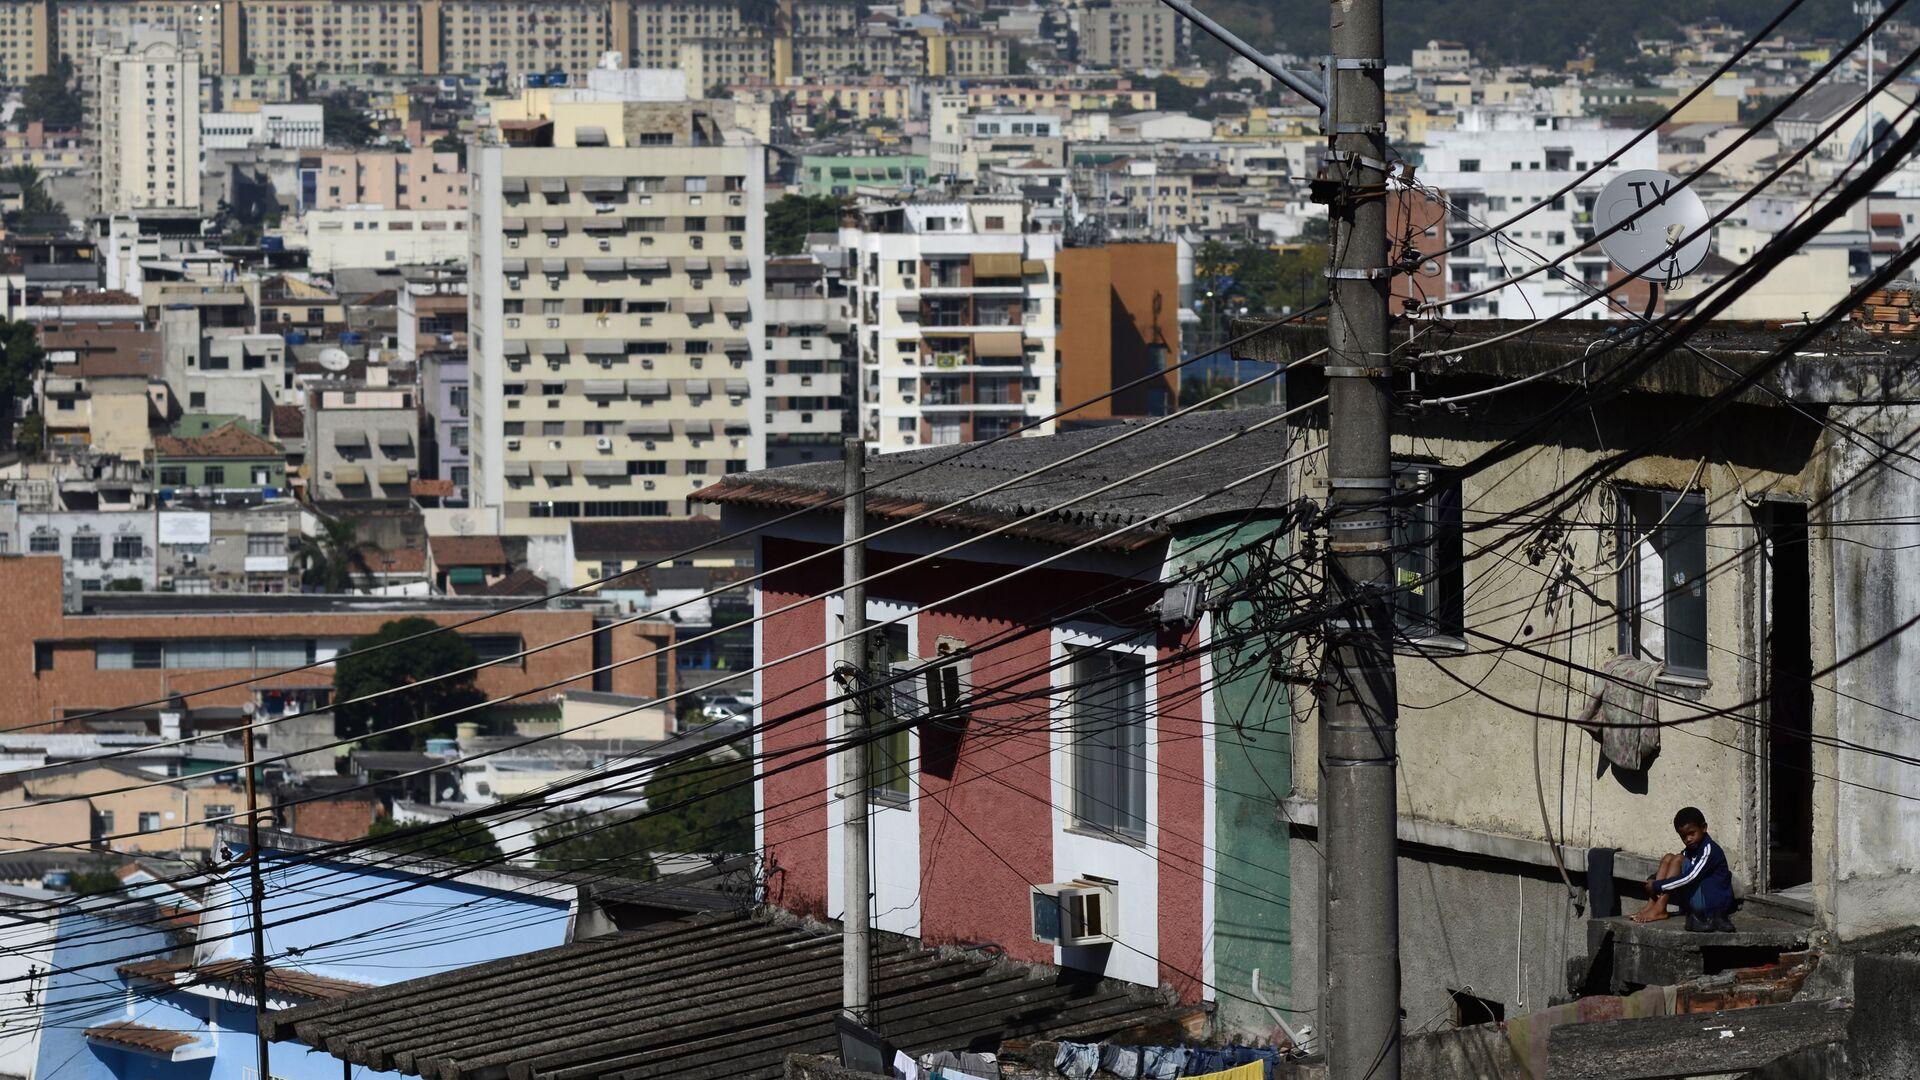 Пригород Рио-де-Жанейро, Бразилия - РИА Новости, 1920, 08.05.2021